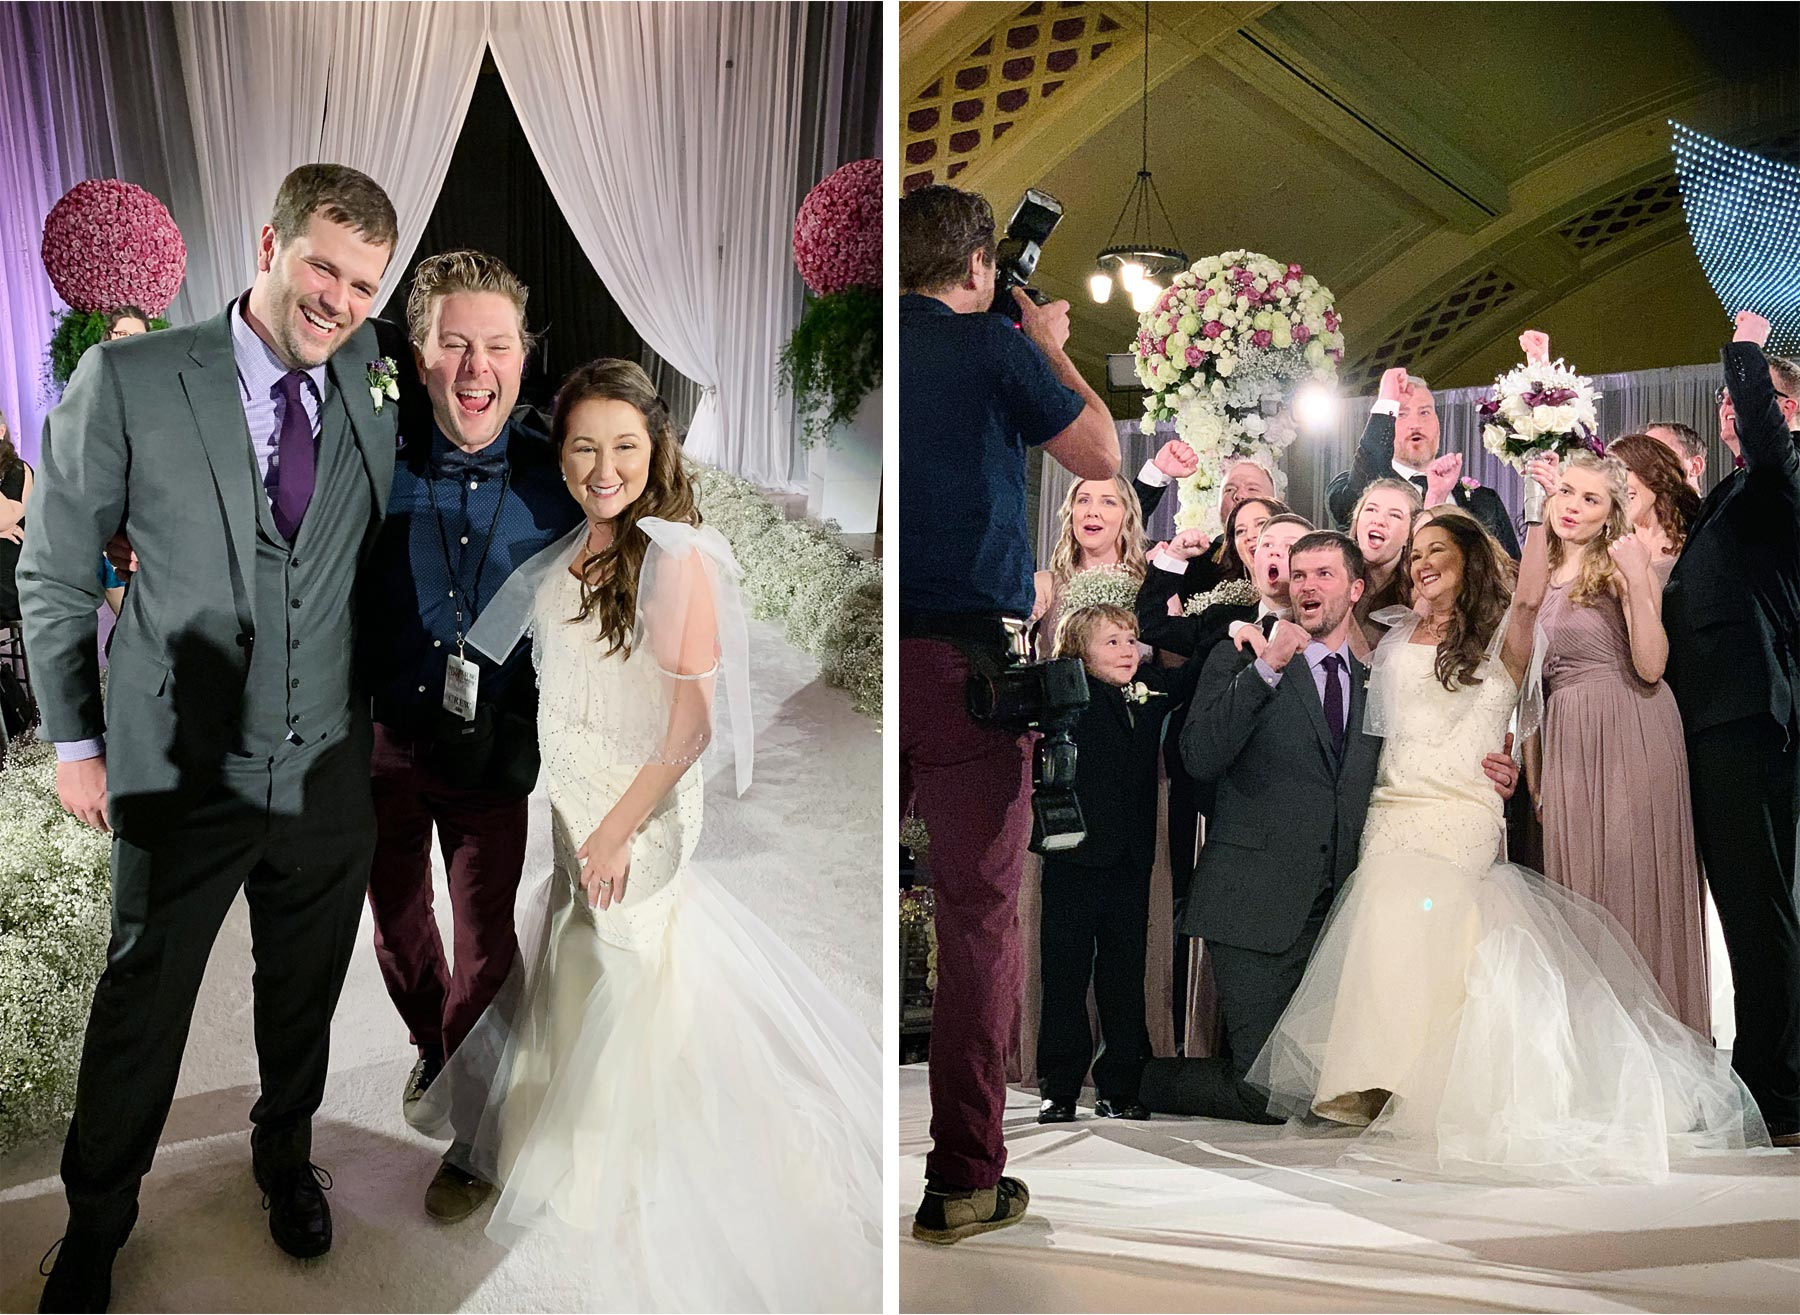 15-Andrew-Vick-Photography-My-Great-Big-Live-Wedding-with-David-Tutera-Behind-the-Scenes-Minnesota-Union-Depot-Saint-Paul.jpg